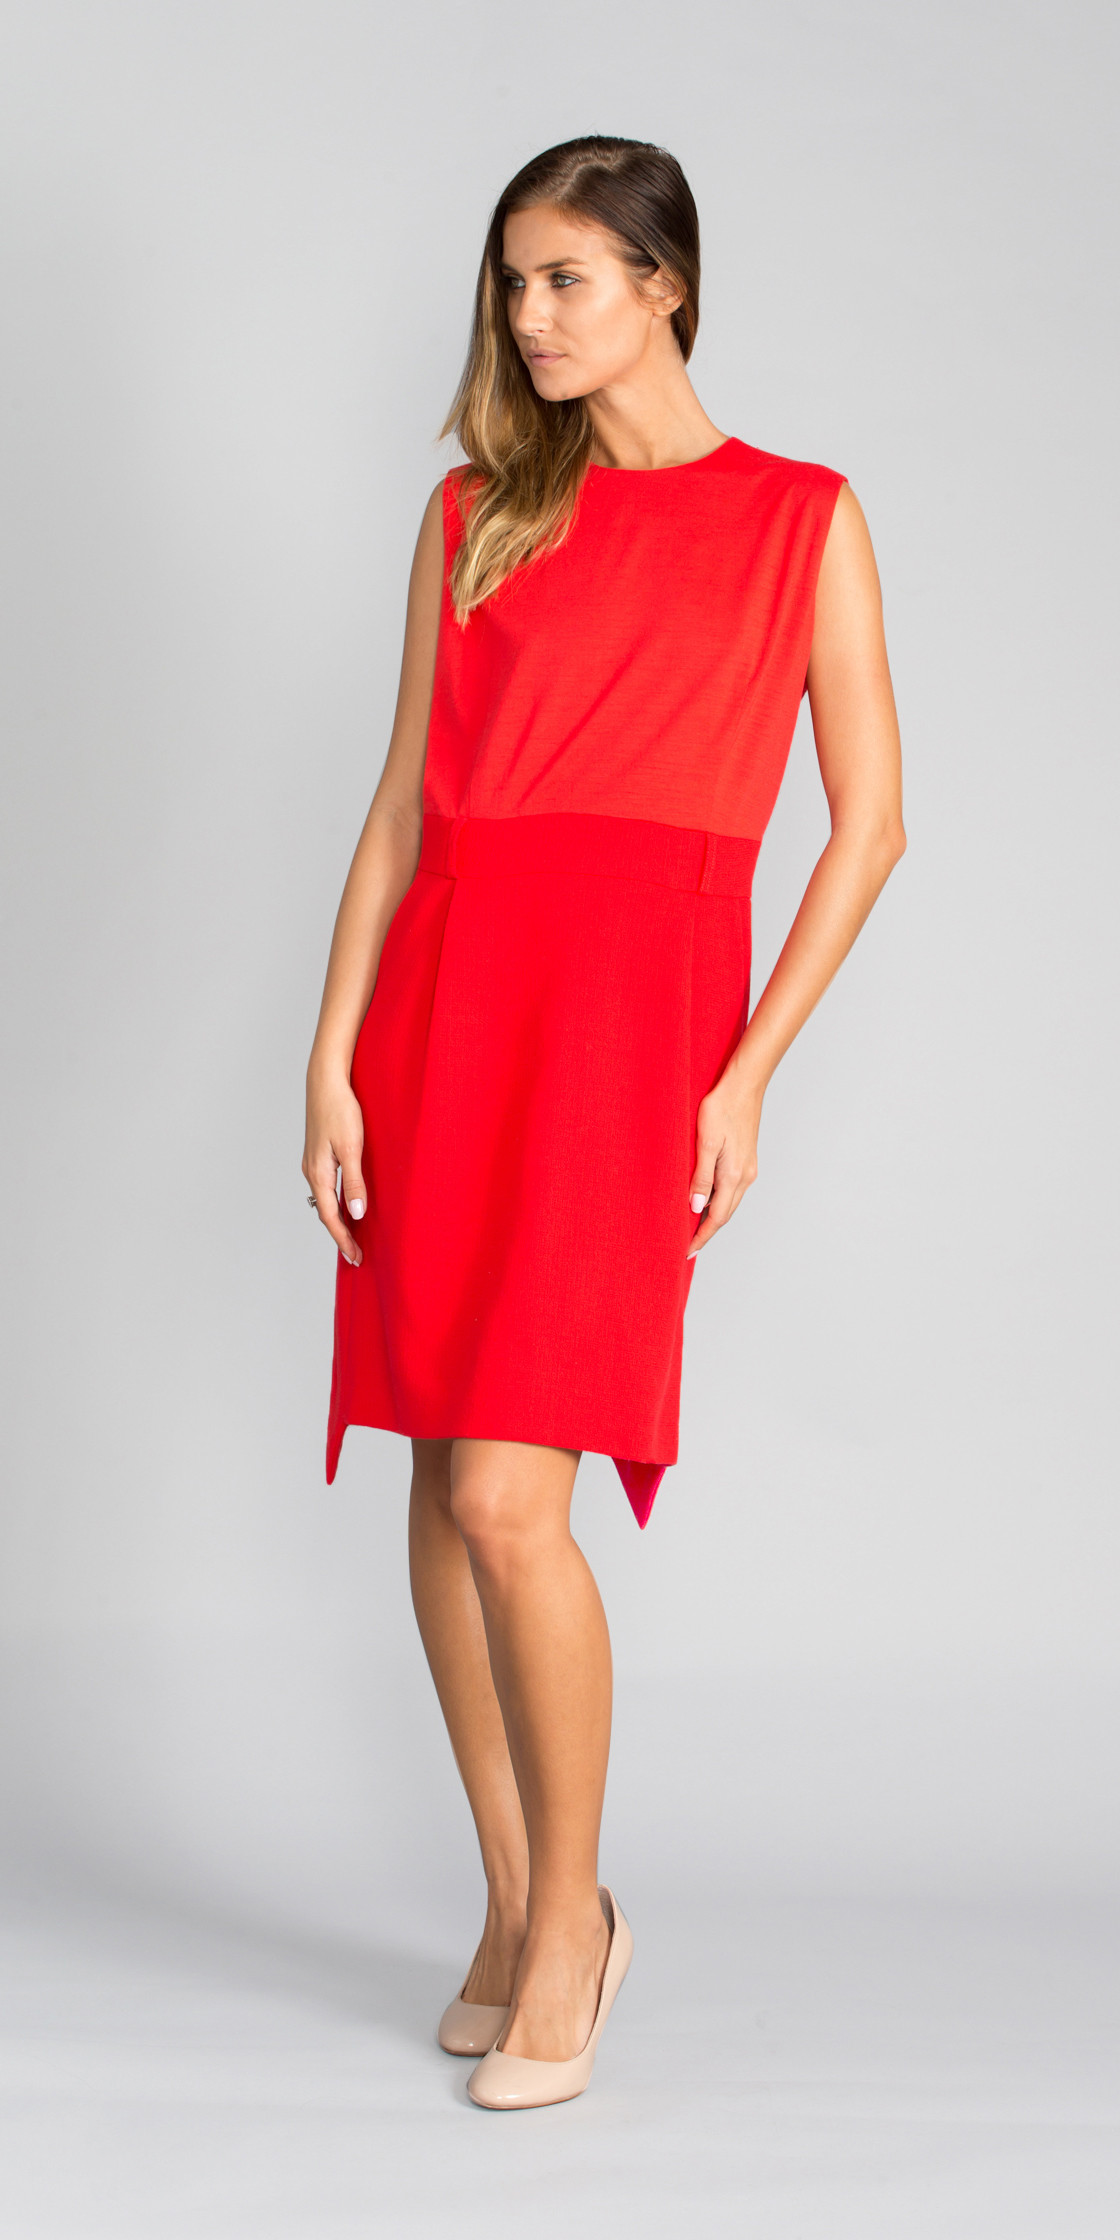 Preen by Thornton Bregazzi Asymmetric Trimmed Dress